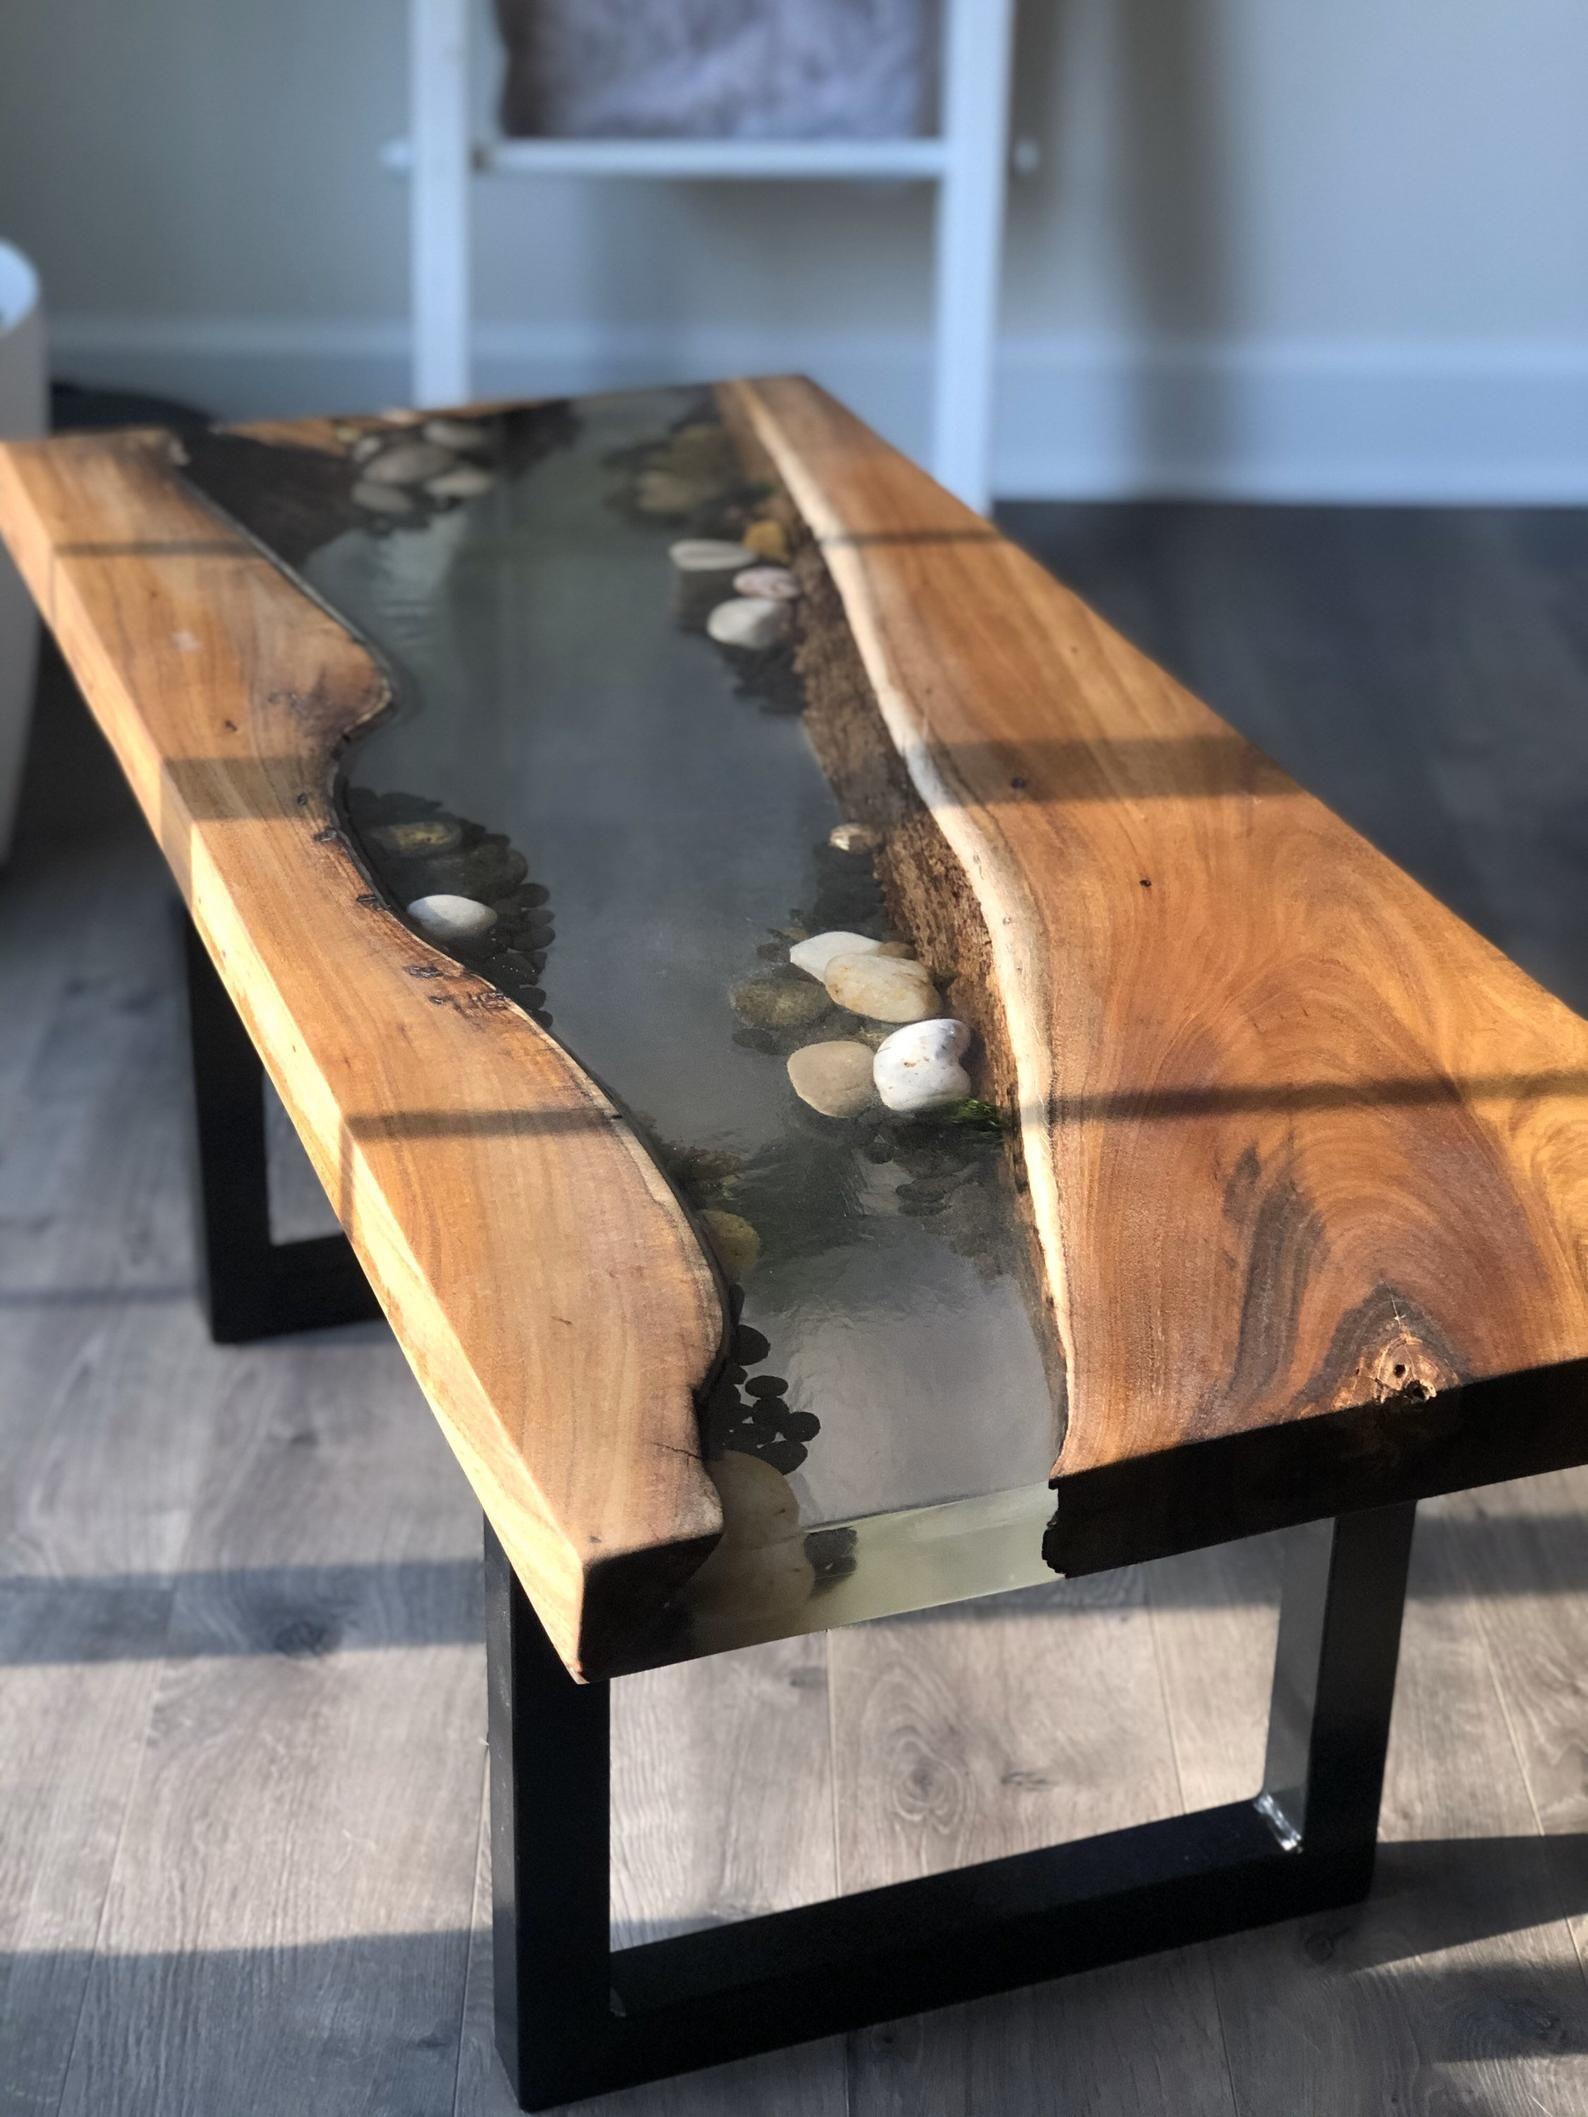 Live Edge Epoxy Resin Acacia Riverbed Coffee Table Etsy Slab Table Live Edge Coffee Table Live Edge Table [ 2117 x 1588 Pixel ]